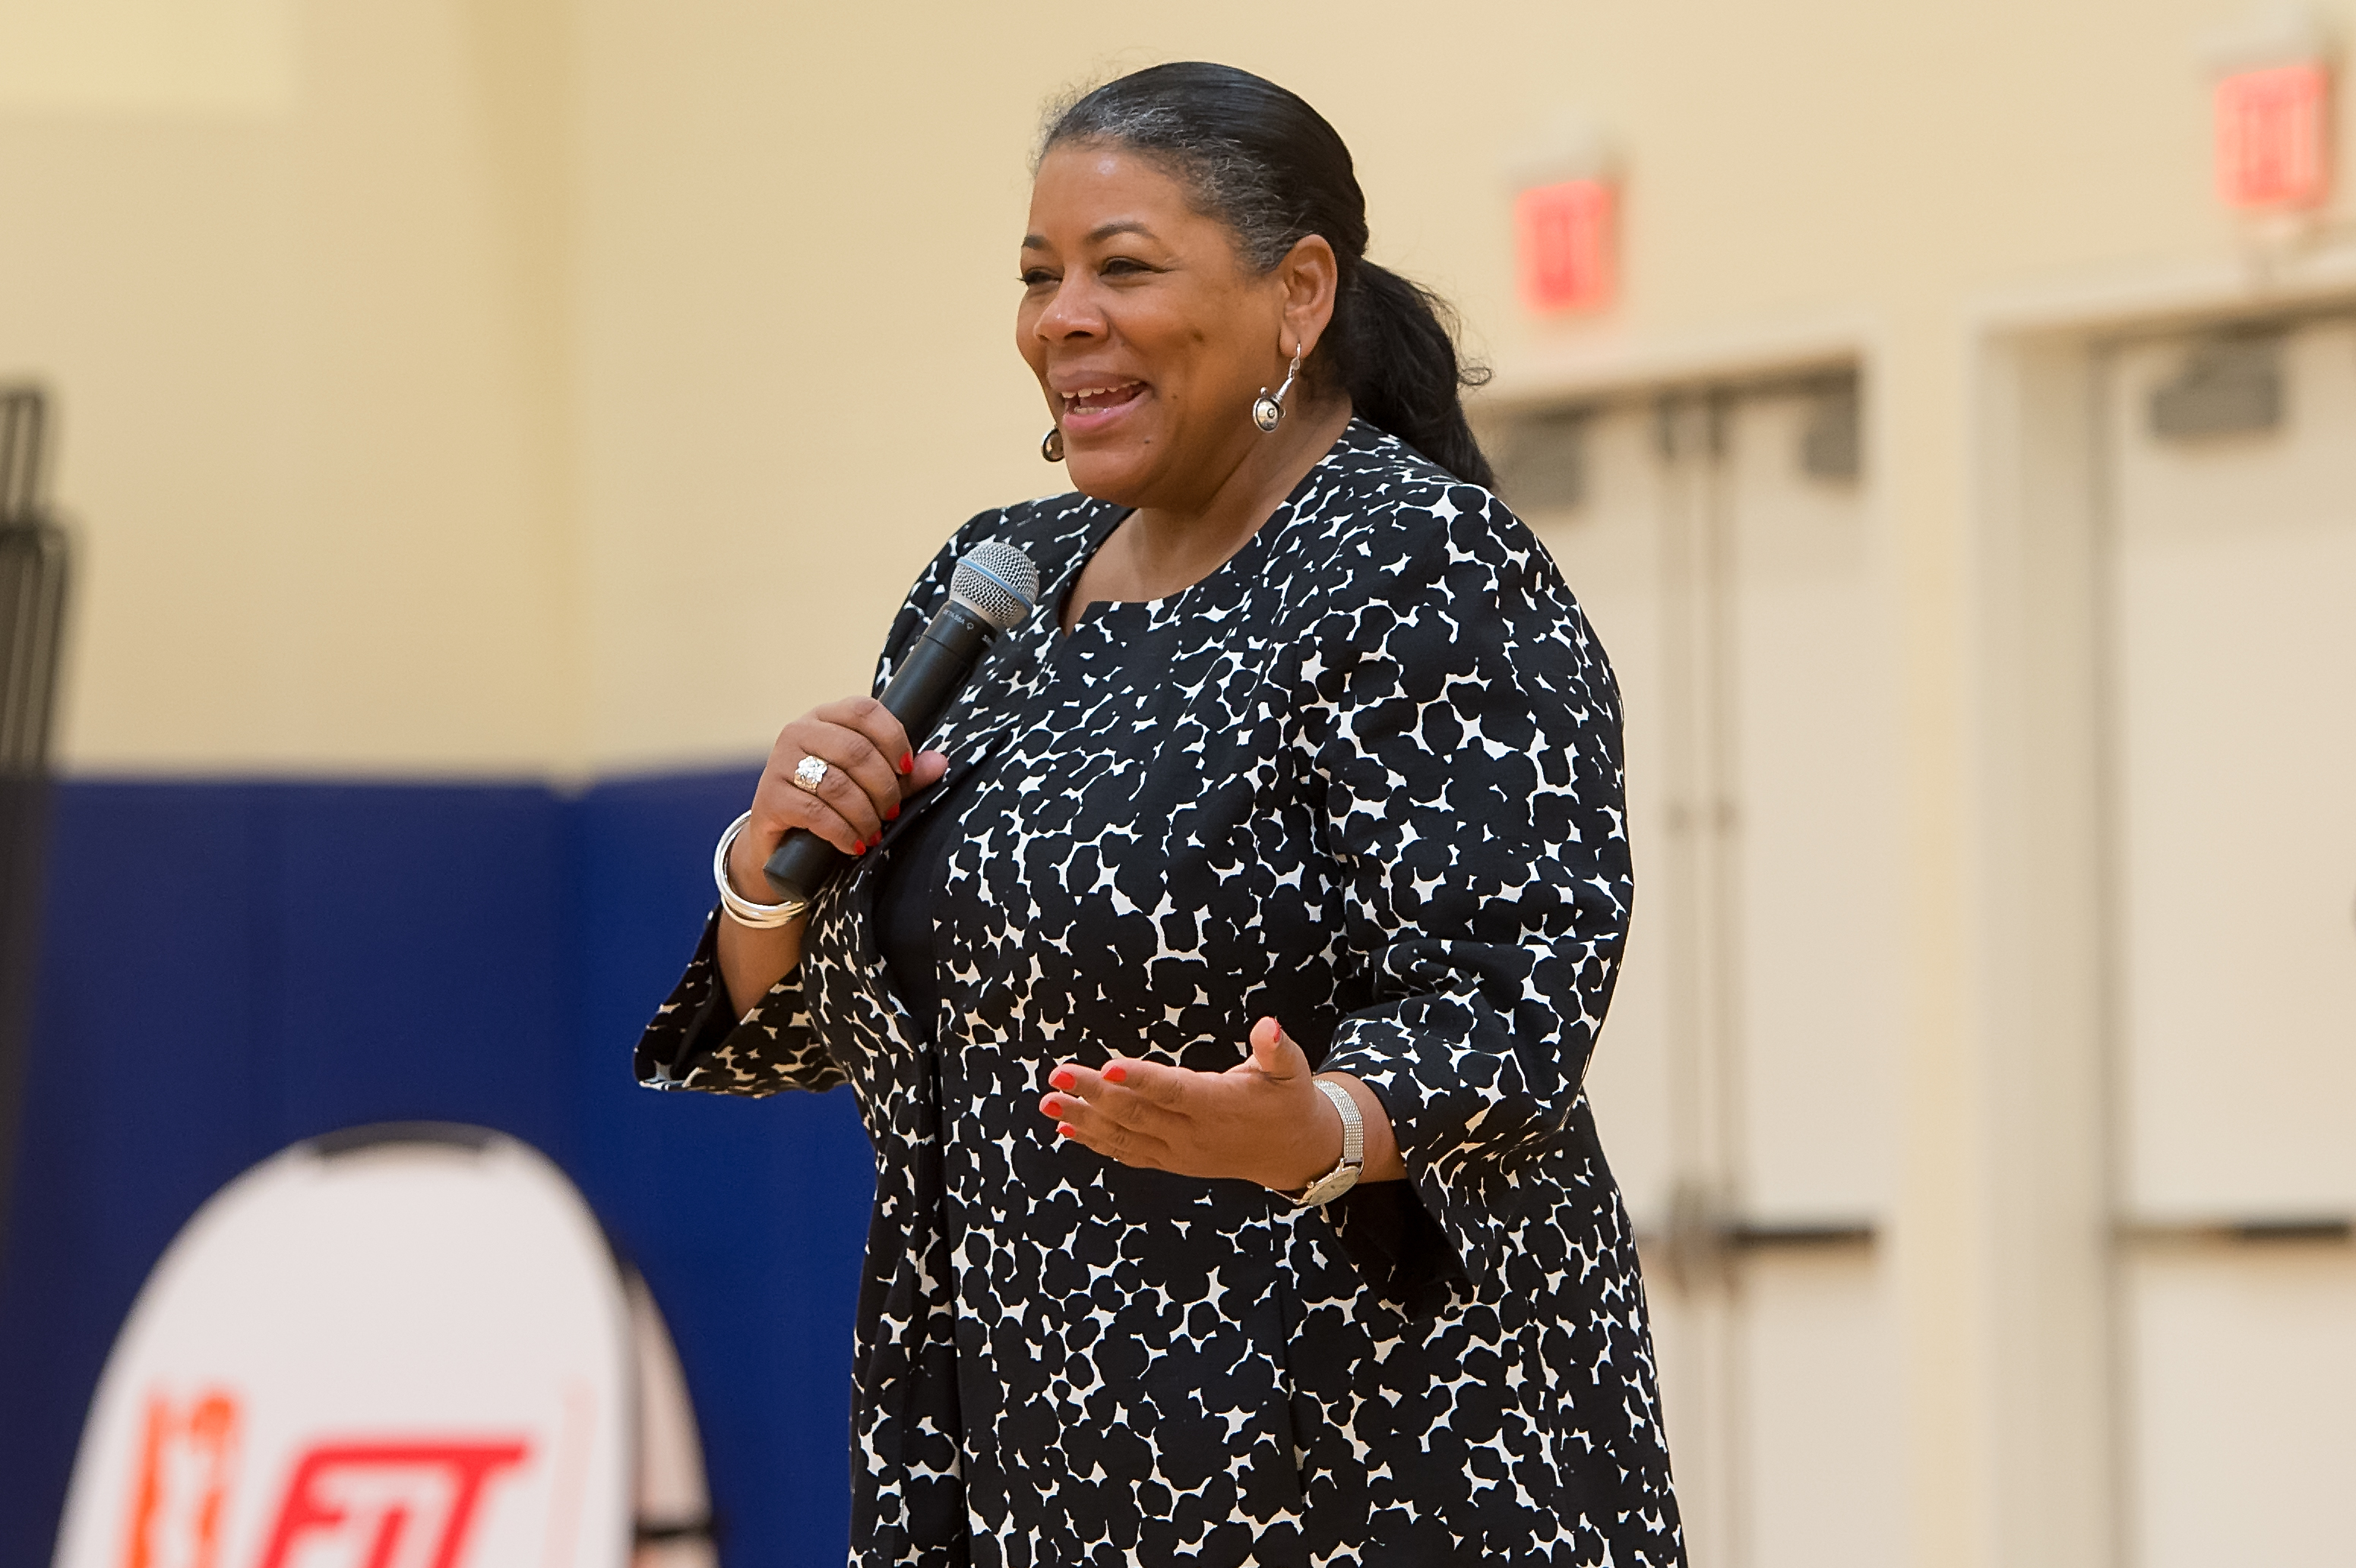 WNBA President Laurel Richie